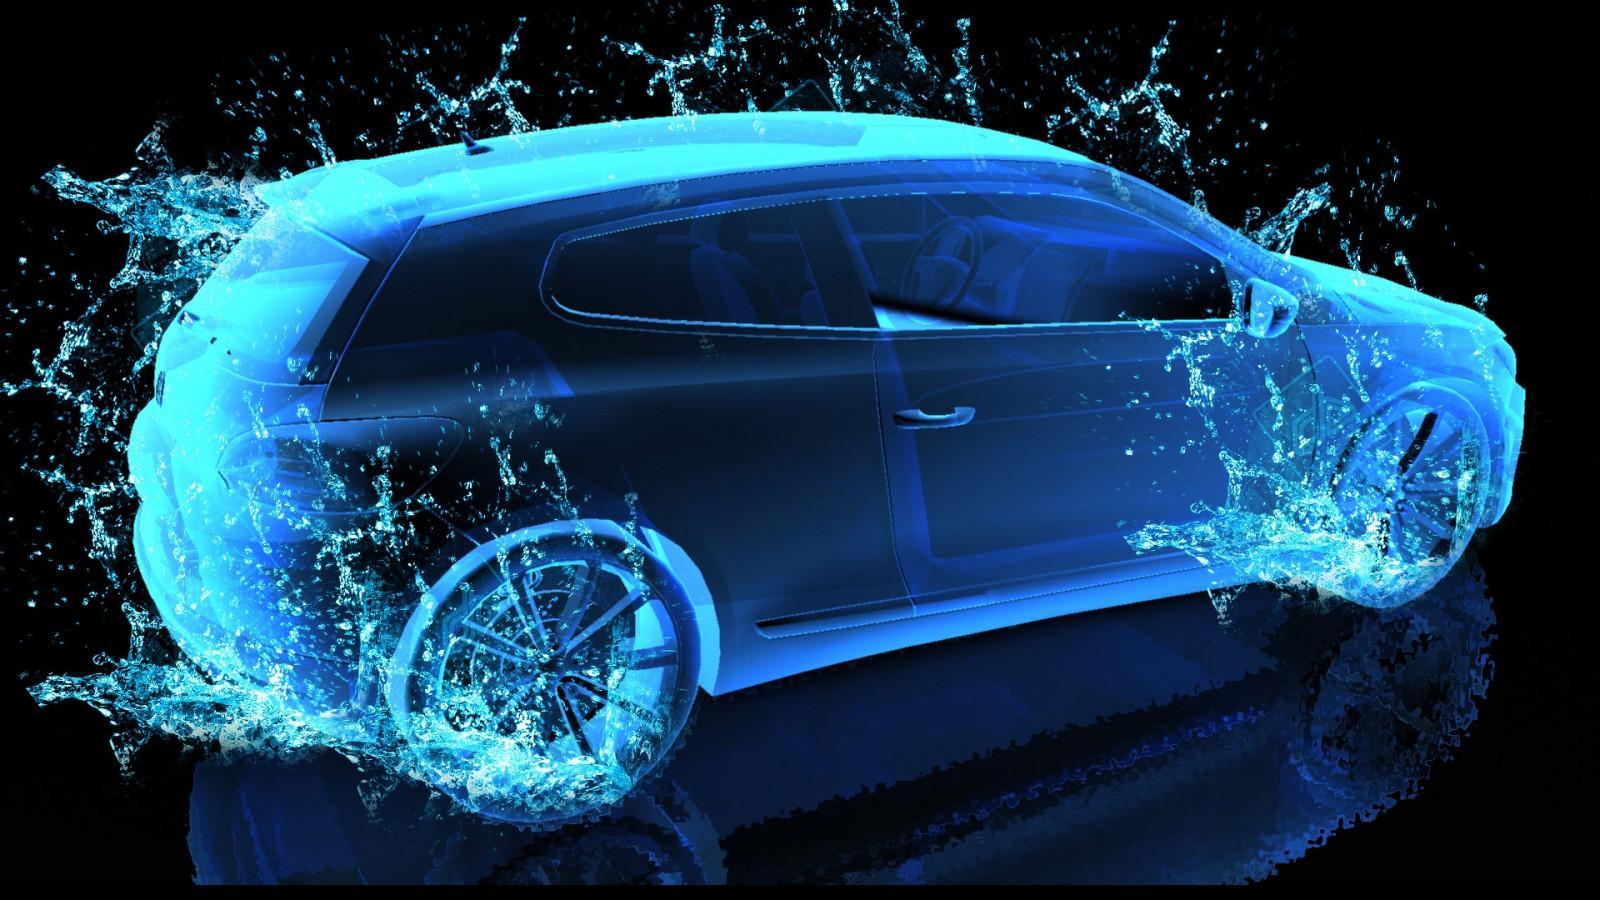 Neon Car Lights: Wallpaper : Lights, Neon, Car, Vehicle, Wheel, Cars